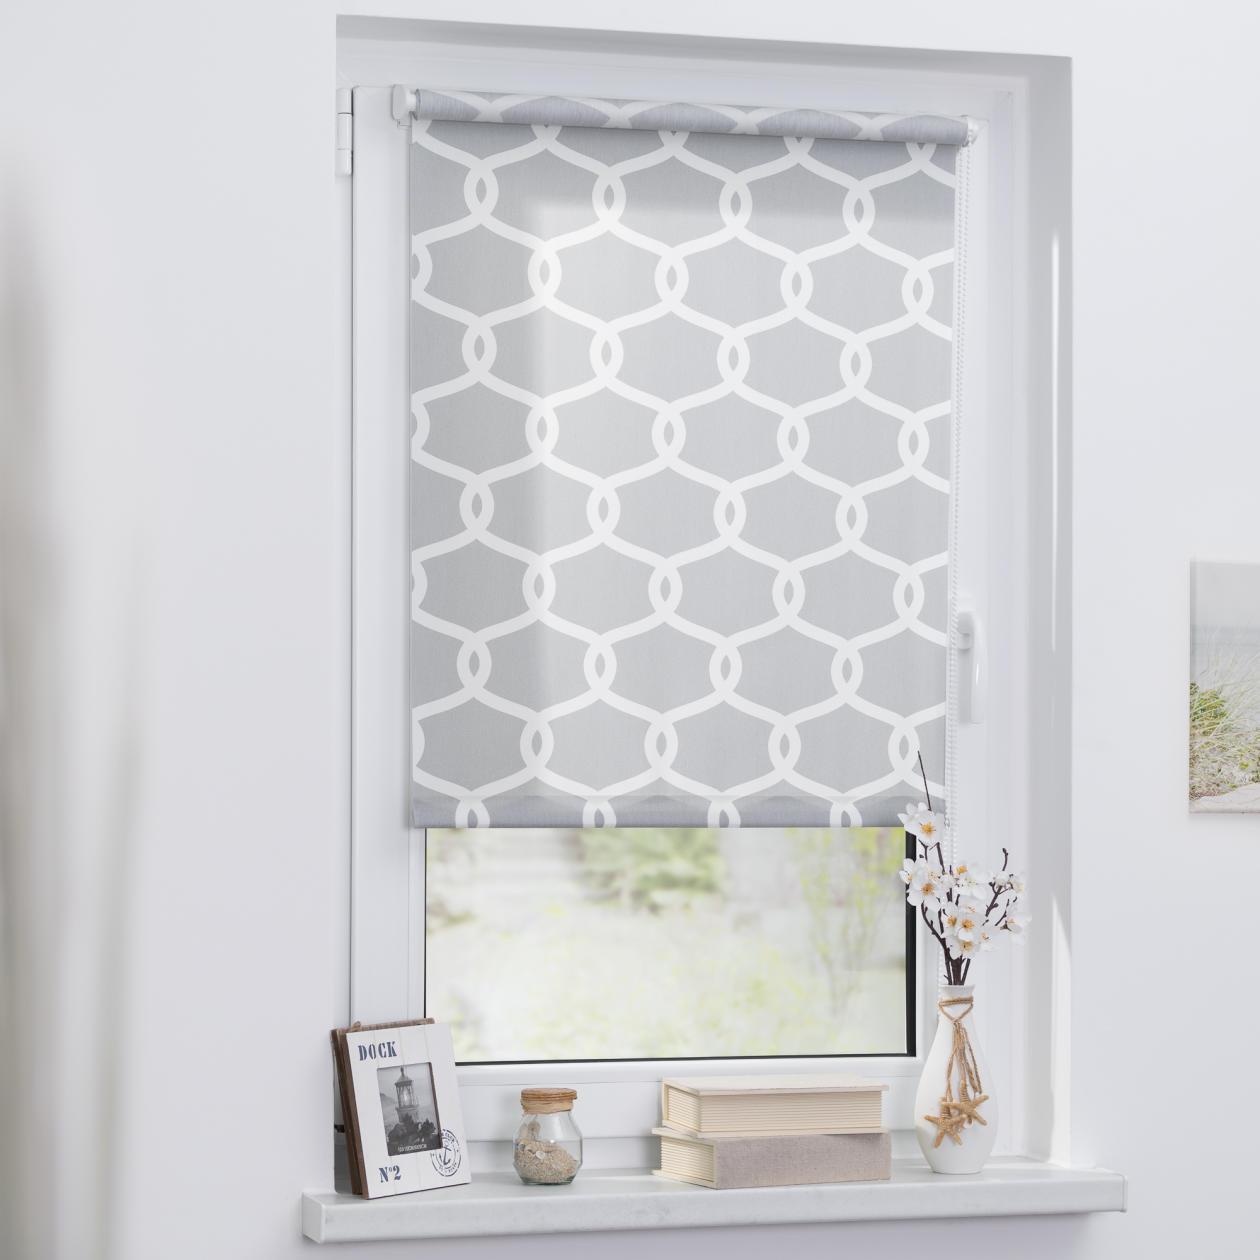 rollo klemmfix ohne bohren blickdicht mesh lichblick shop. Black Bedroom Furniture Sets. Home Design Ideas